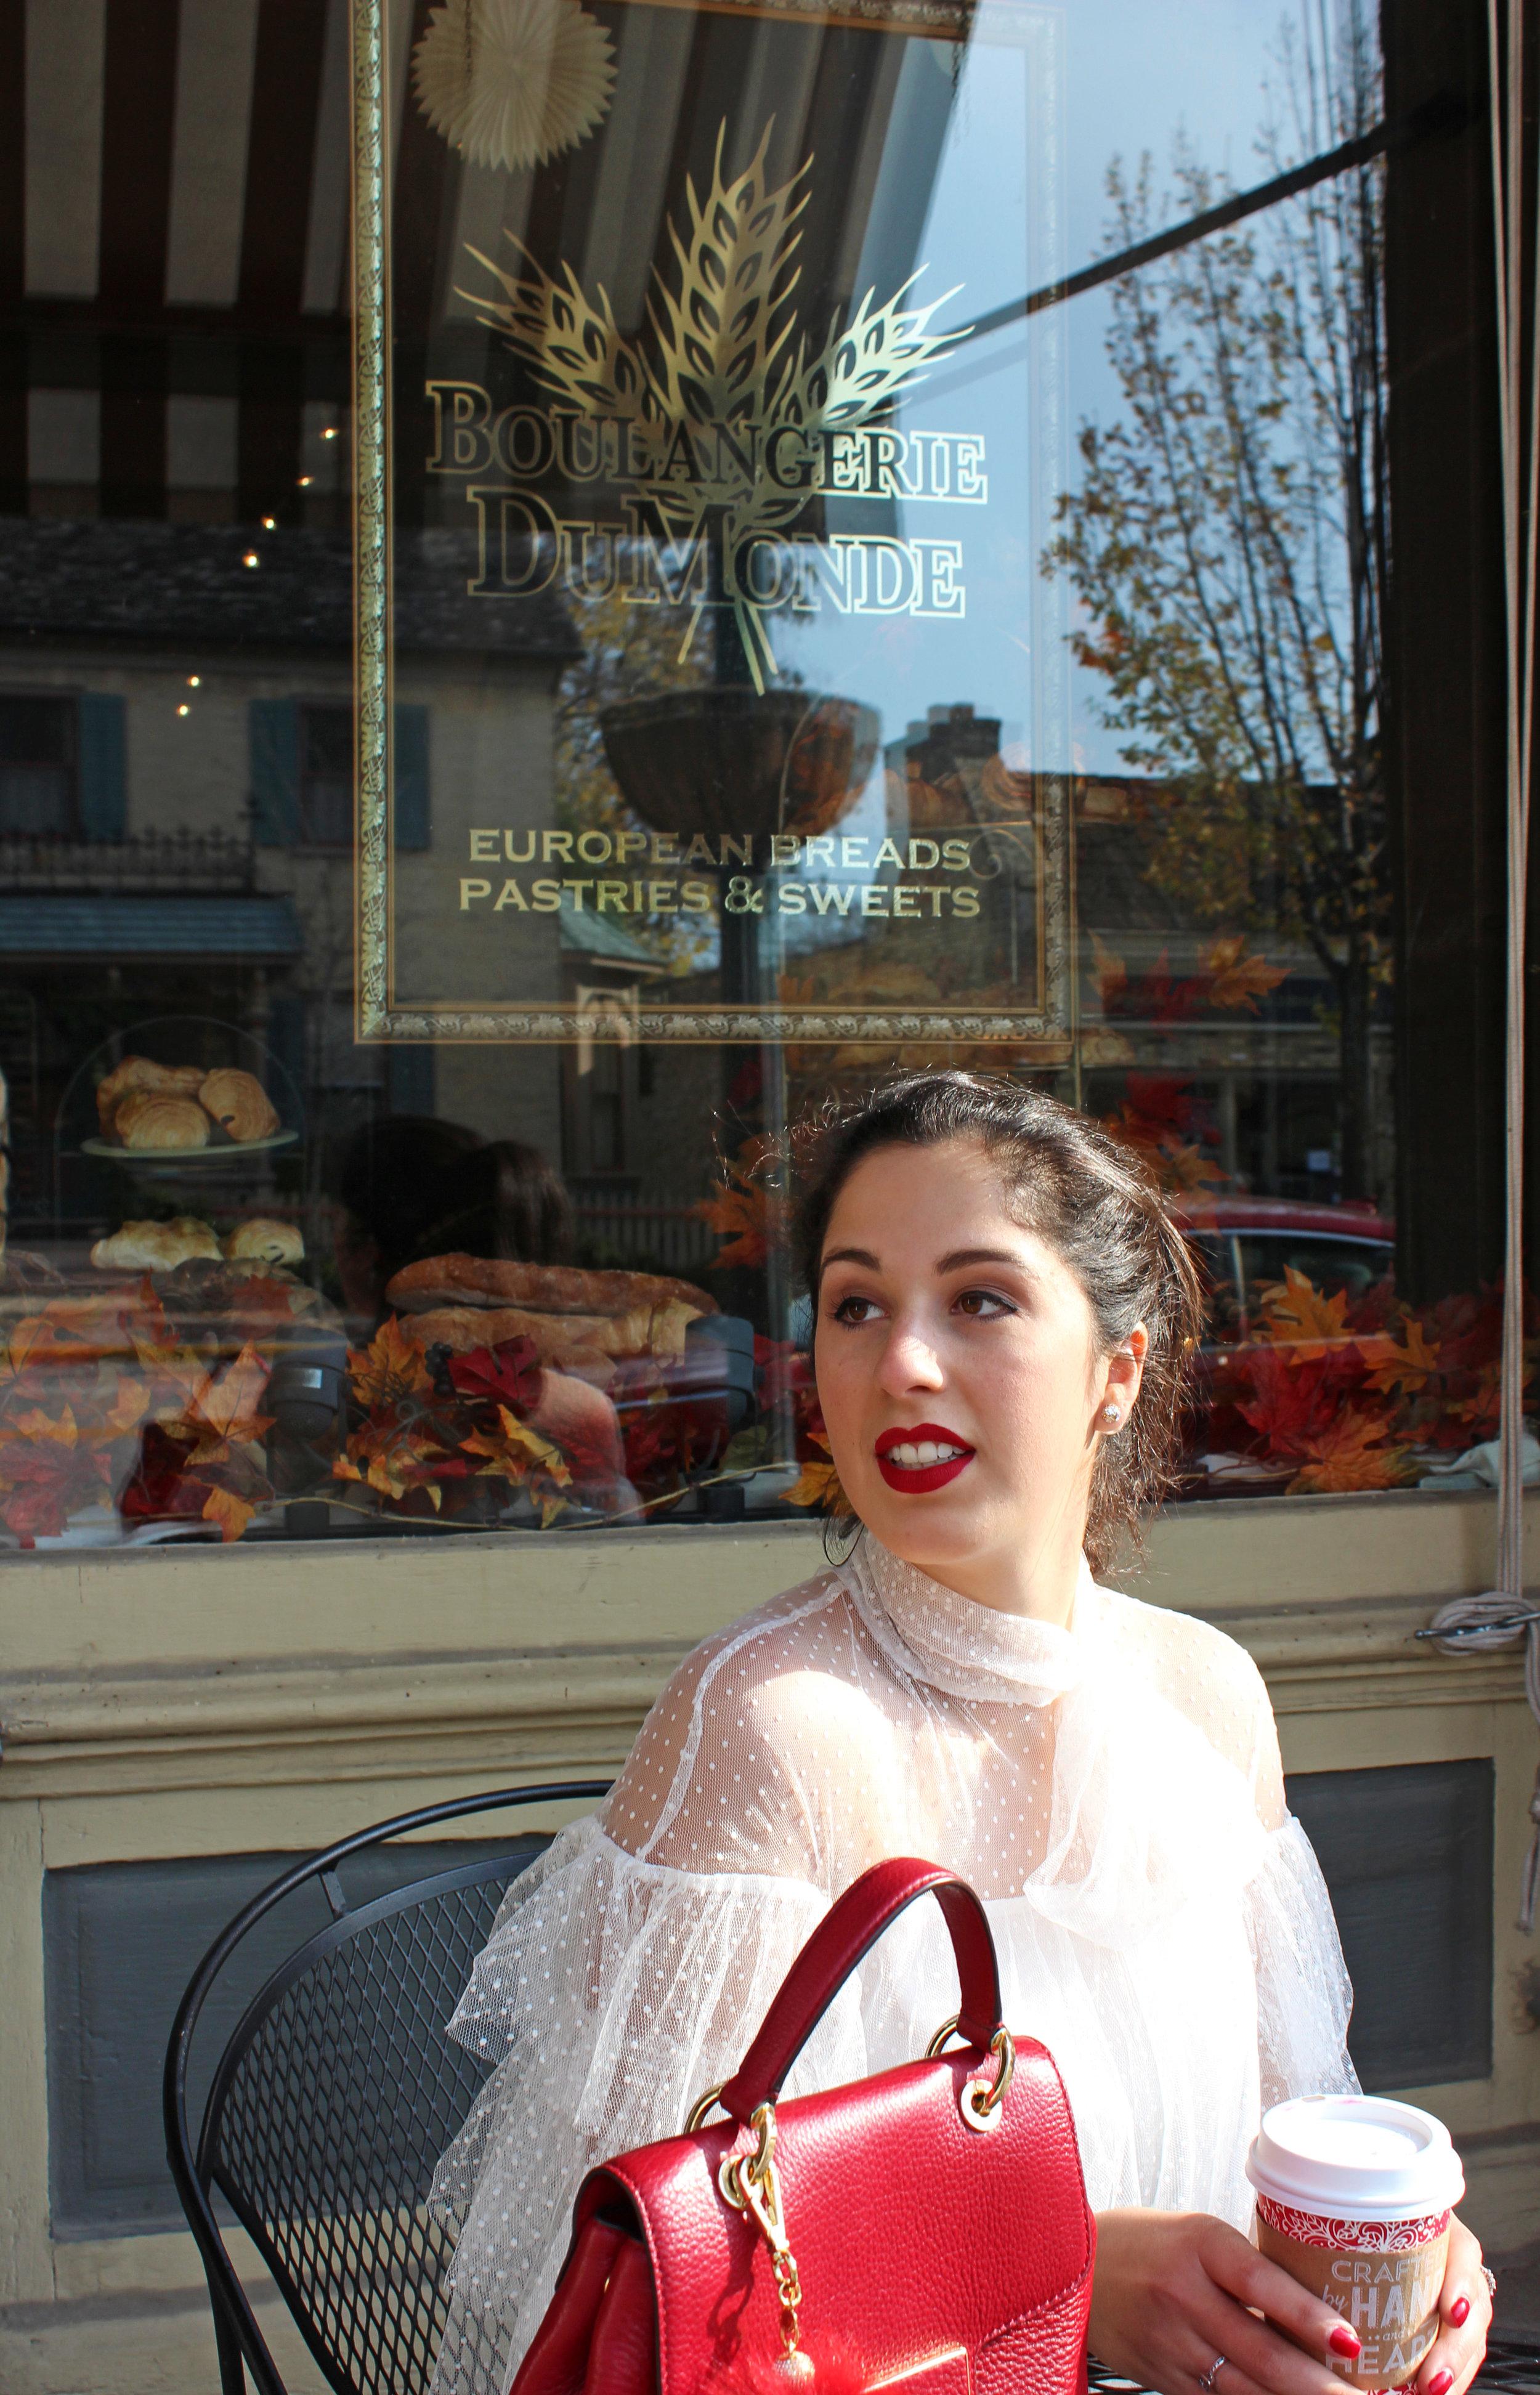 Madalyn Manzeck photographed by  Cassie Sterwald  in downtown Cedarburg in 2016.  Dress  Dezzal  // Handbag  Michael Kors  (in black)// Shoes Aldo // Earrings  Kate Spade  // Lipstick  Stila